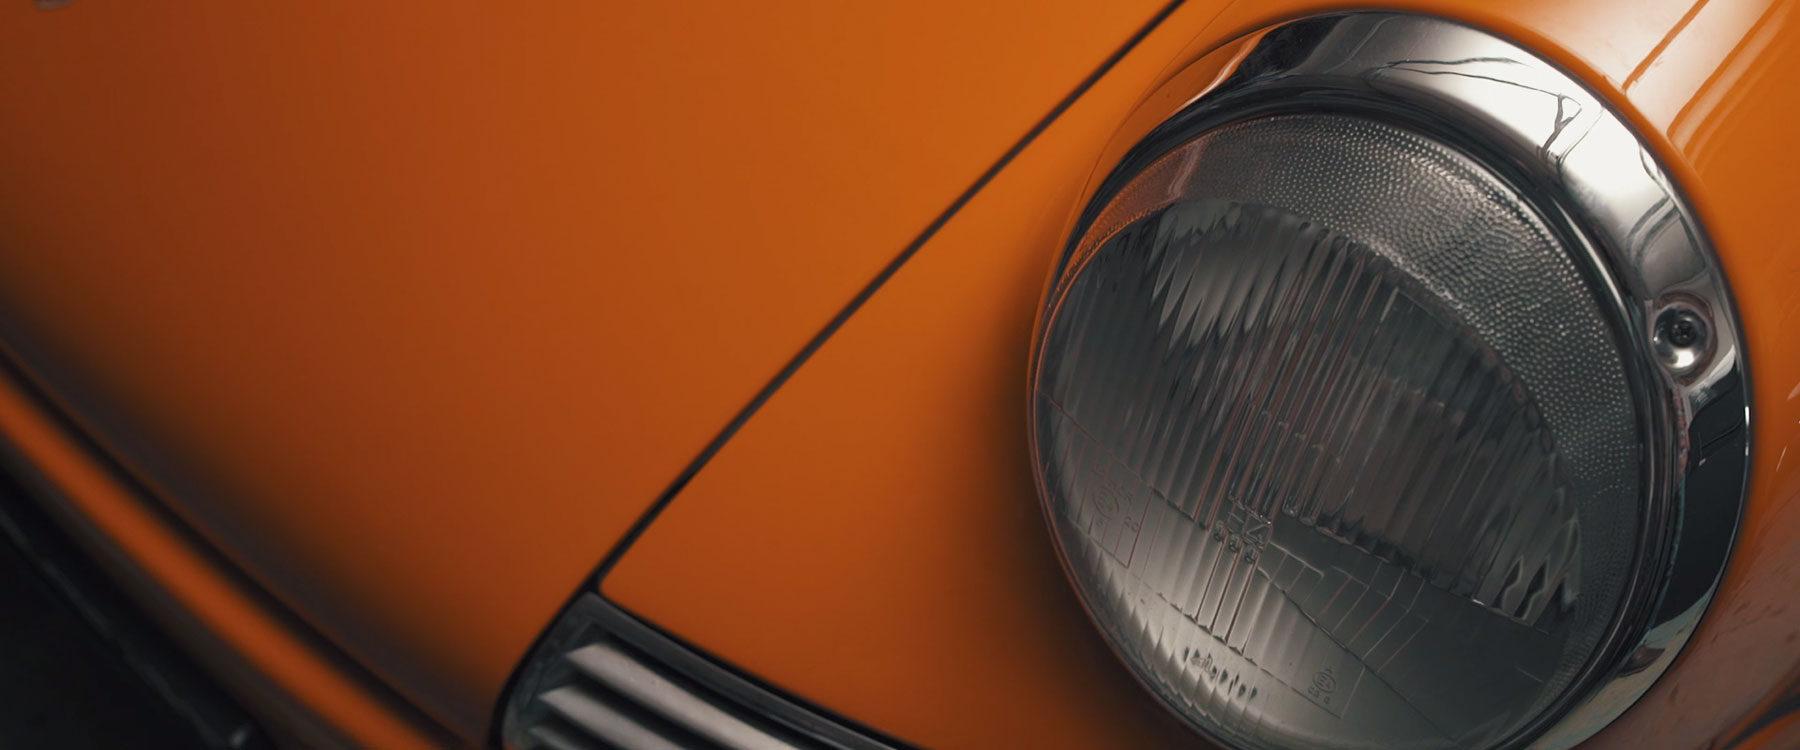 ADOT Lightspeed Classic #001